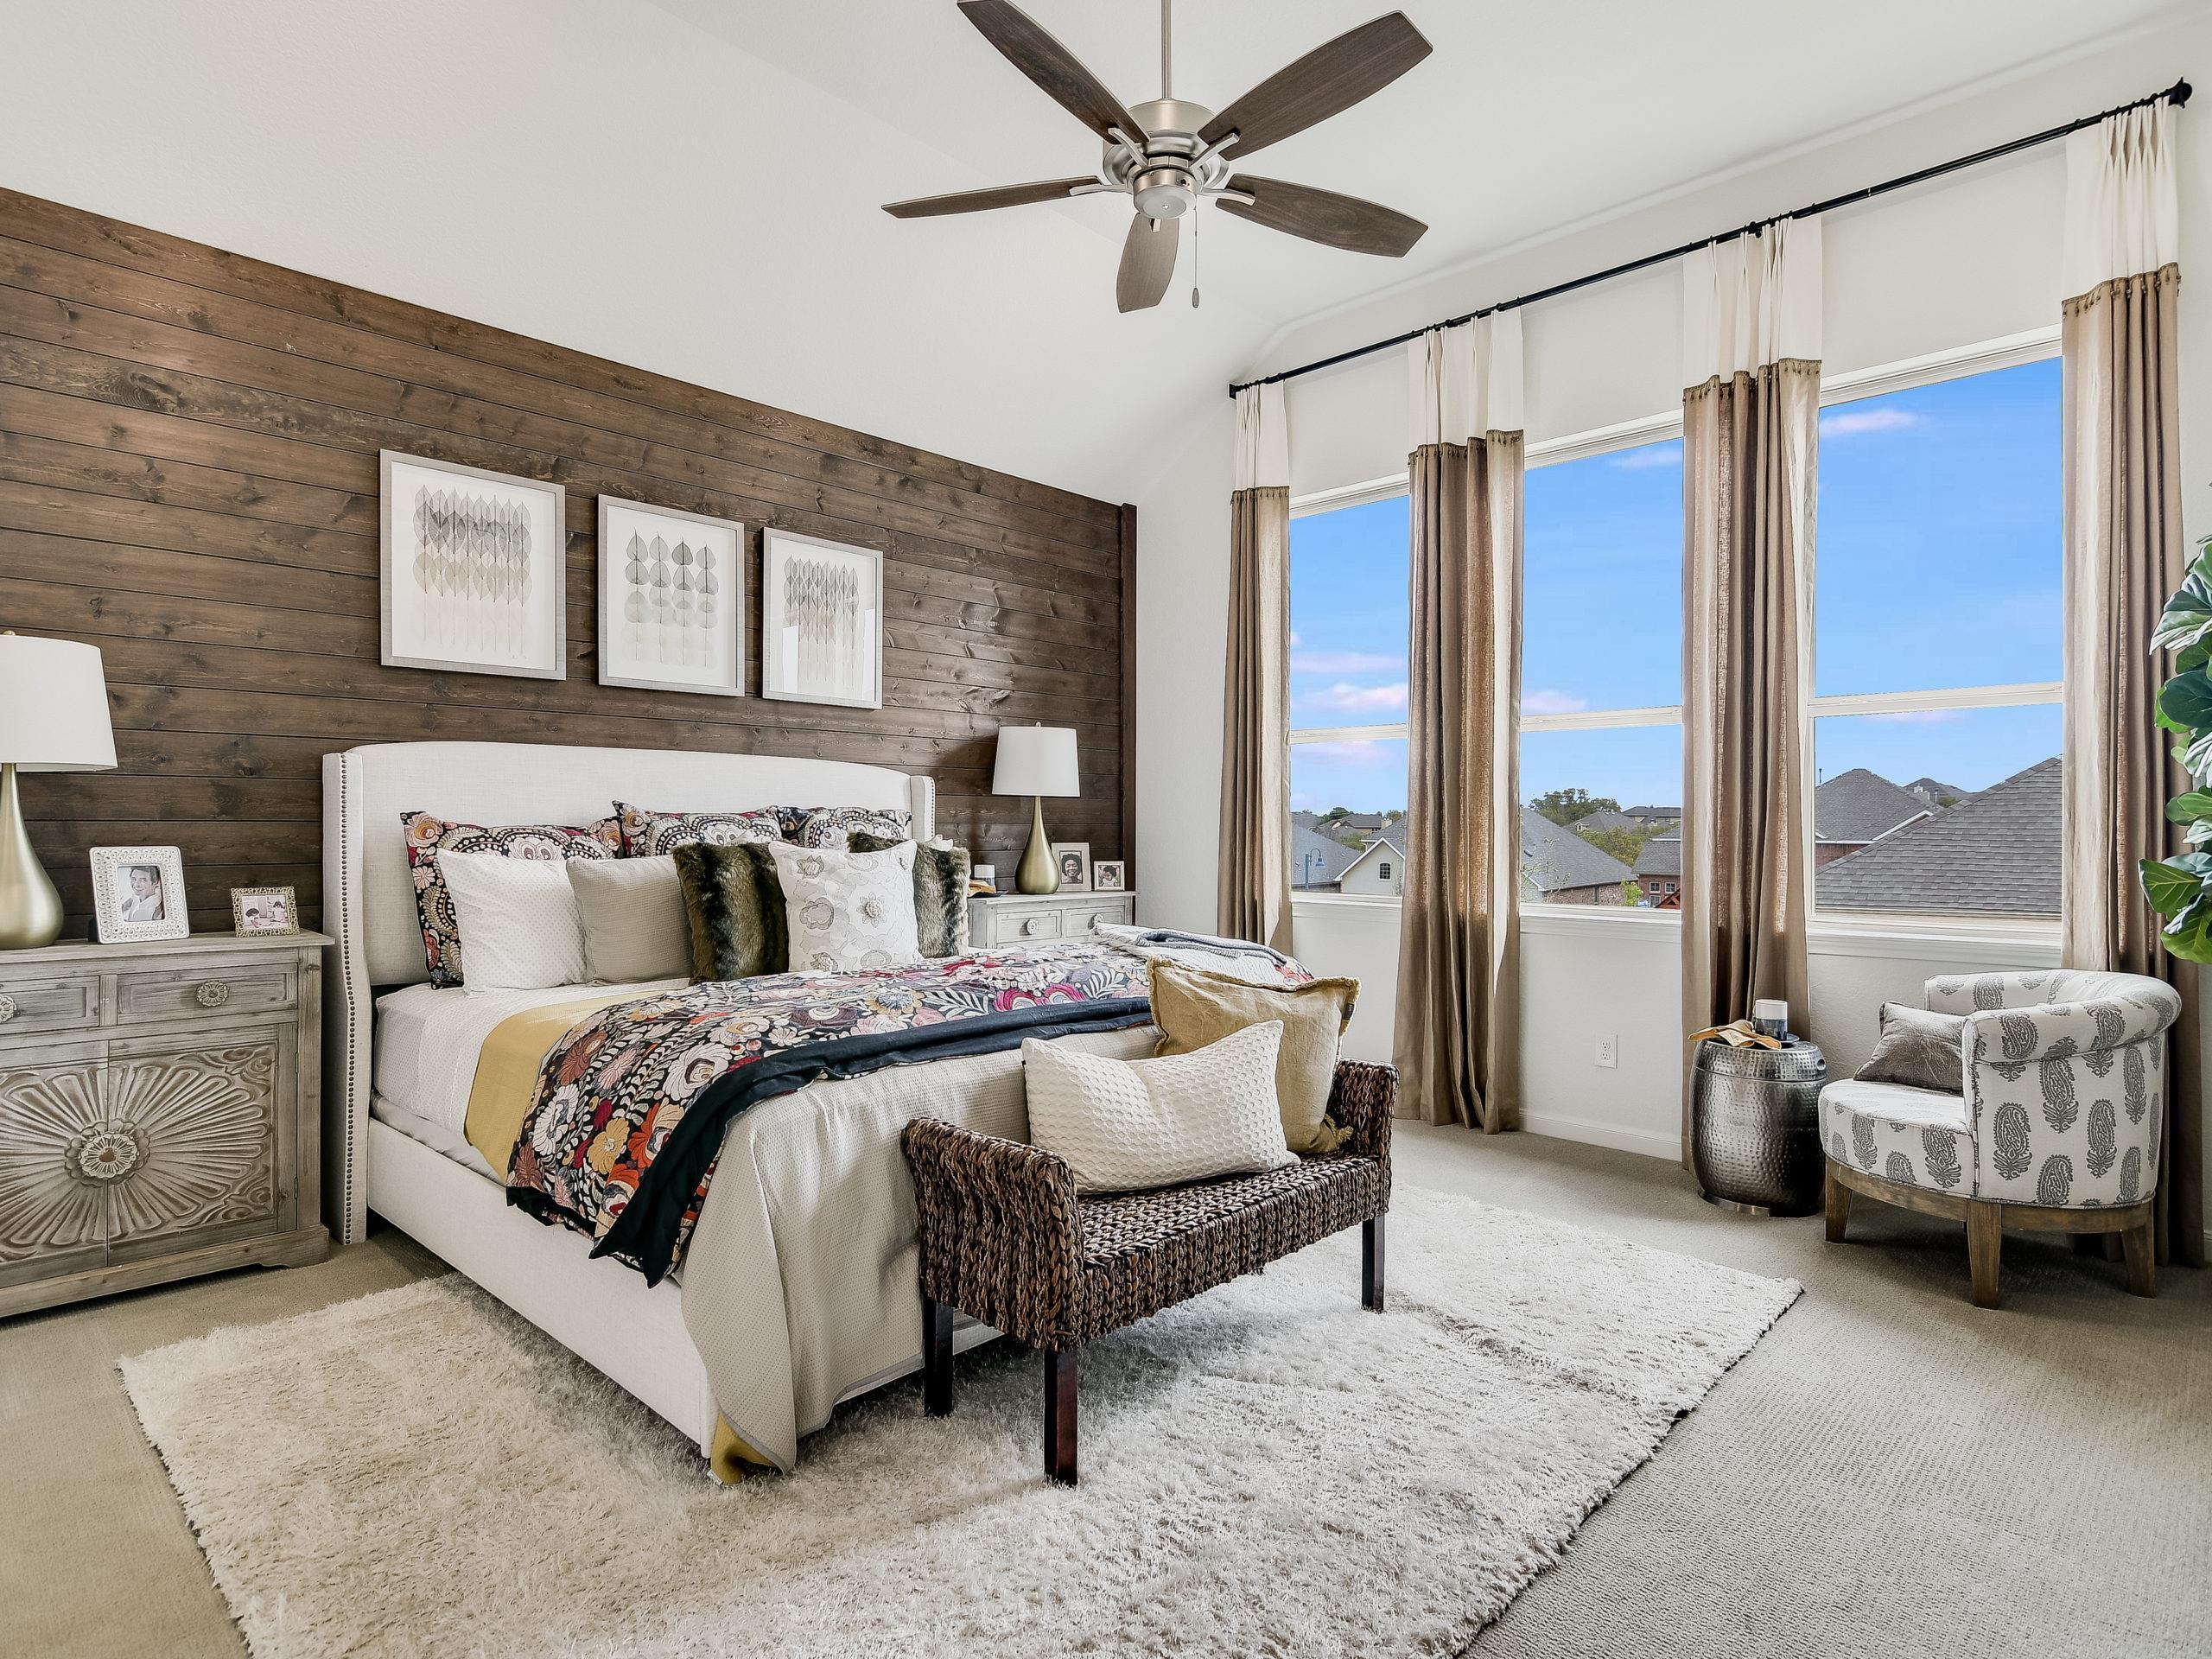 Bedroom featured in the Westwood By Sitterle Homes in San Antonio, TX